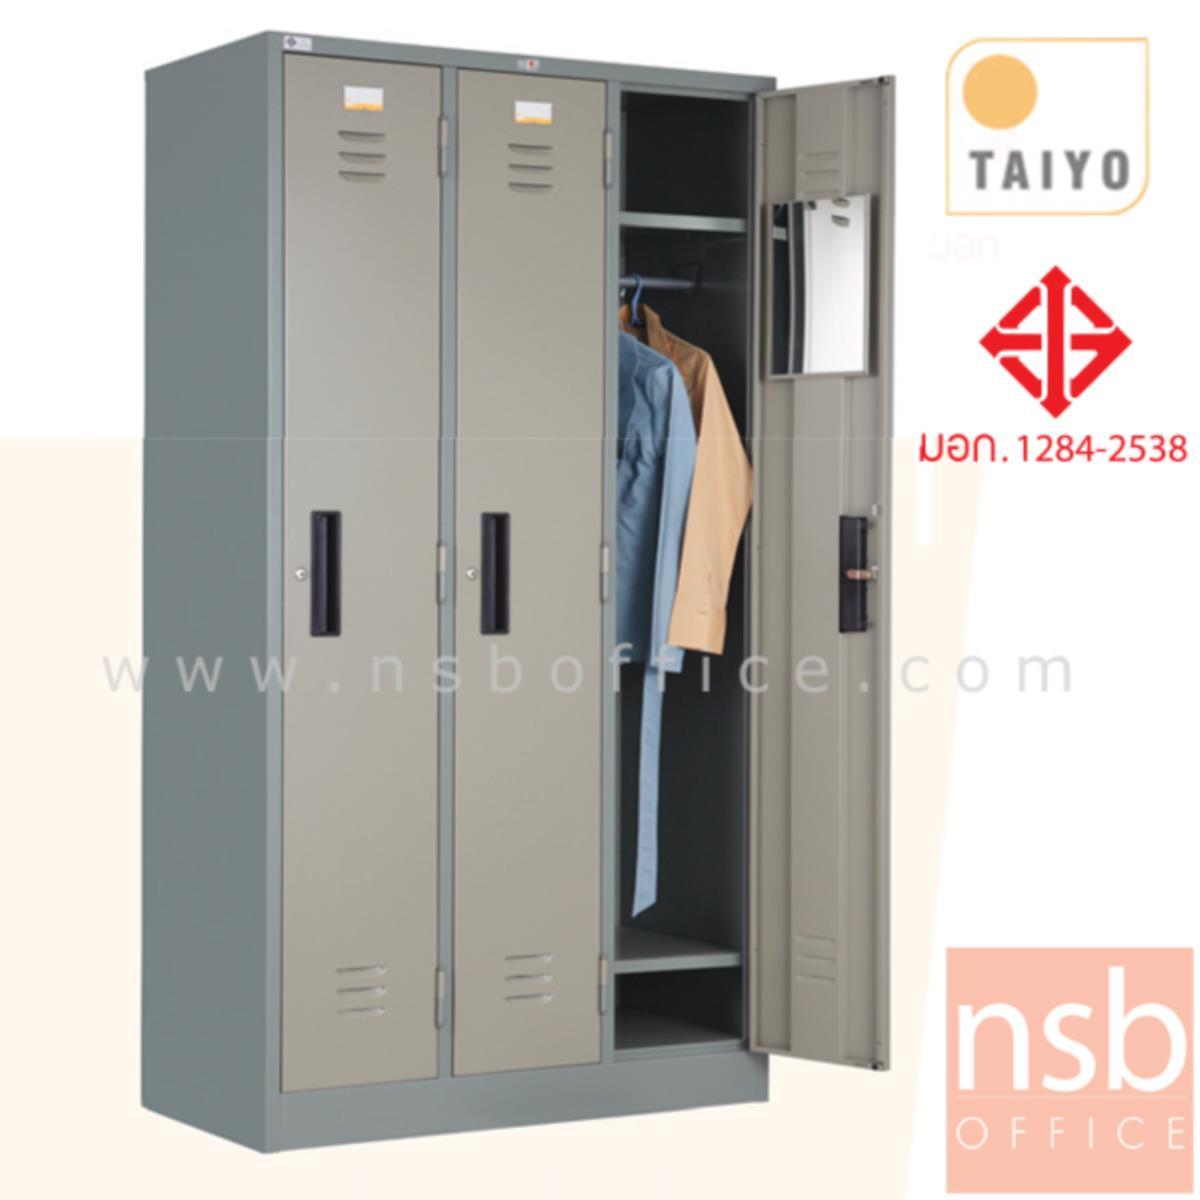 E03A001:ตู้ล็อกเกอร์เหล็ก 3 ประตู กุญแจพร้อมสายยู (มาตรฐาน มอก. 0.7 mm) รุ่น LK-003